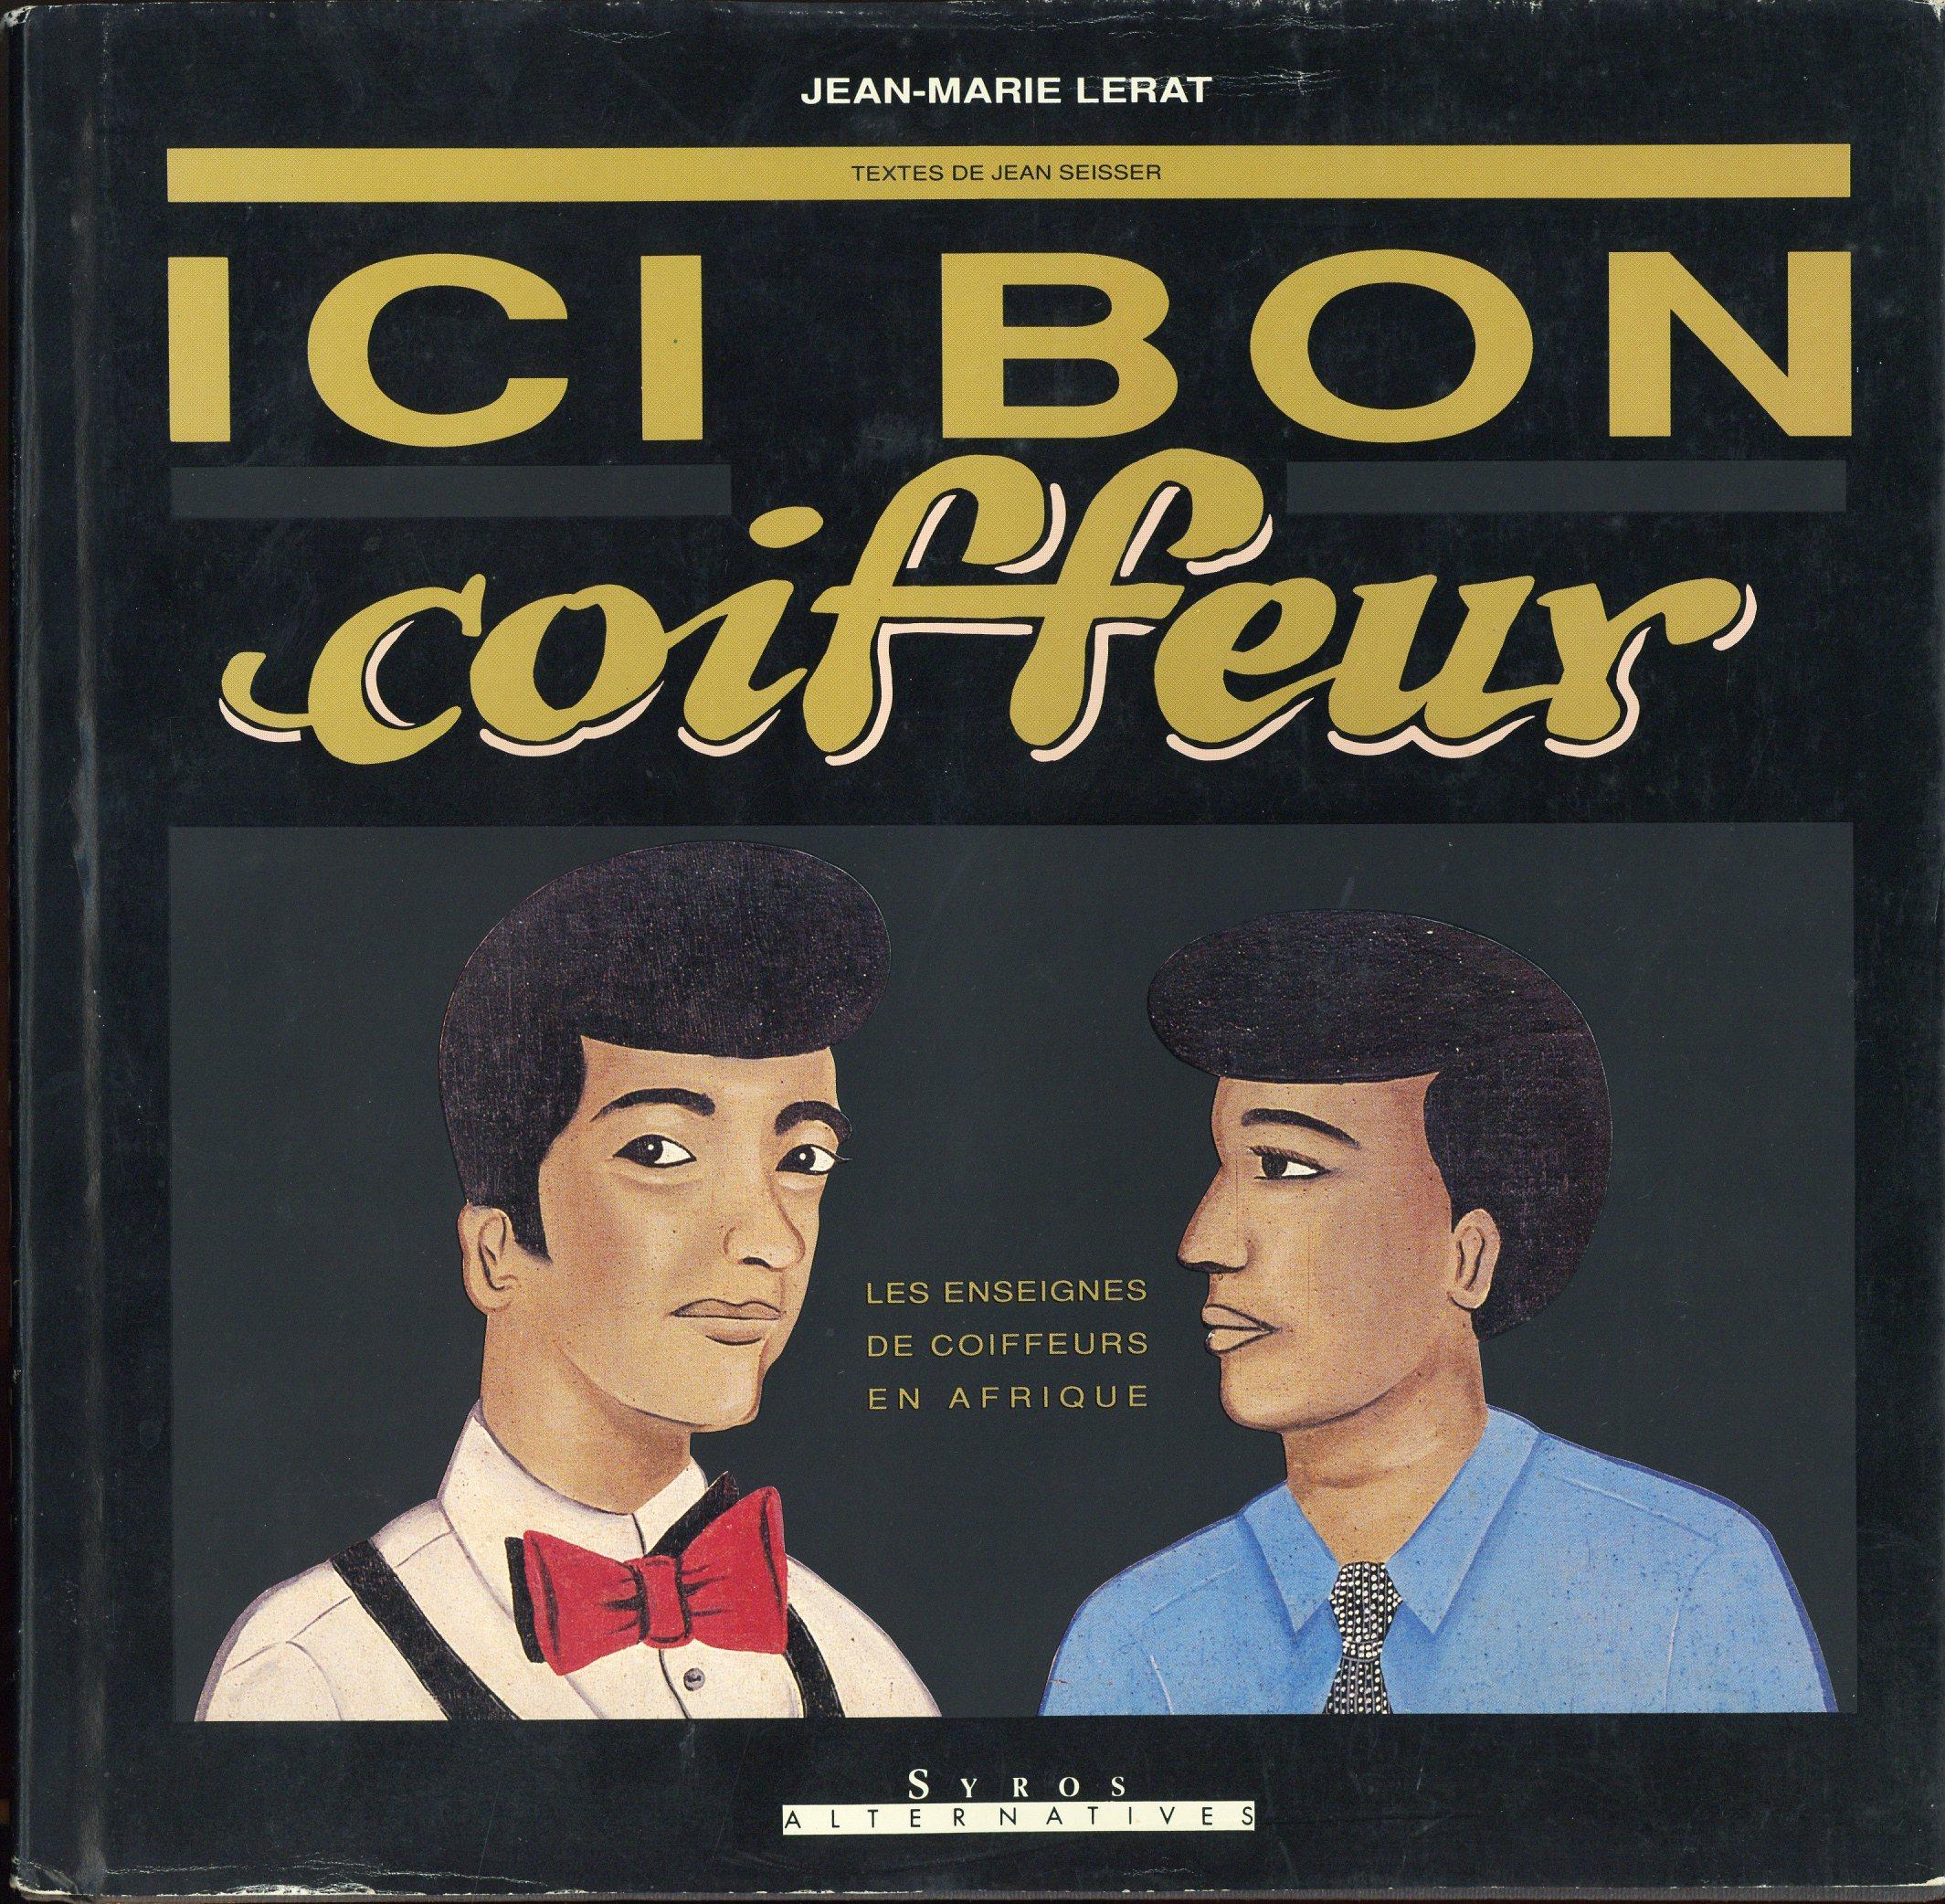 "Jean Marie Lerat Ici Bon Coiffeur Á¾ã'""だらけ Mandarake"